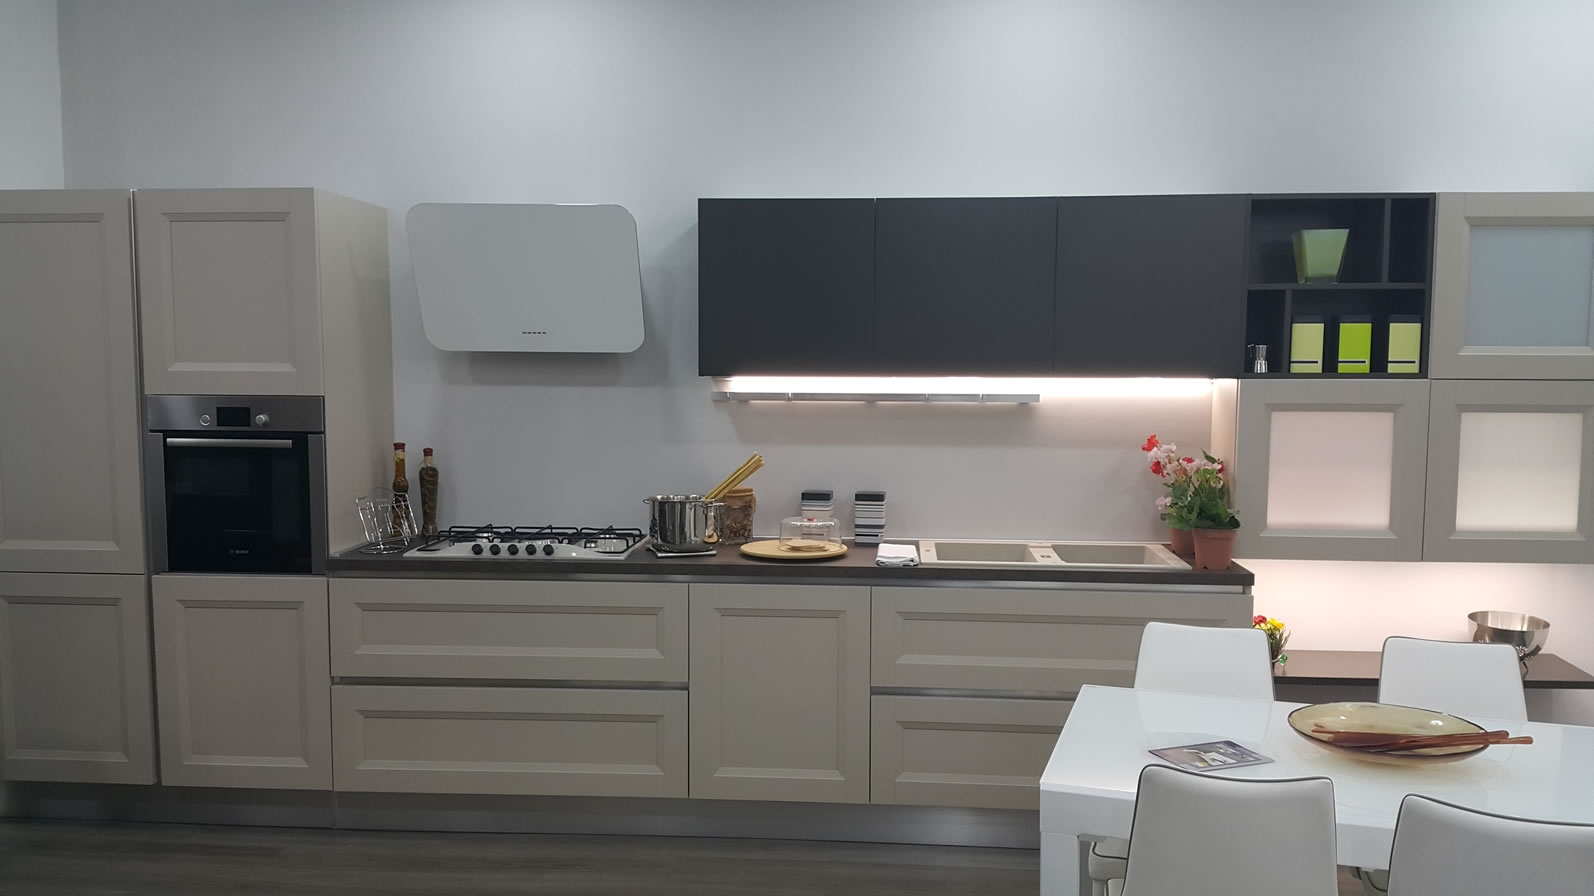 Stunning cucine forma 2000 images - Cucine forma 2000 ...